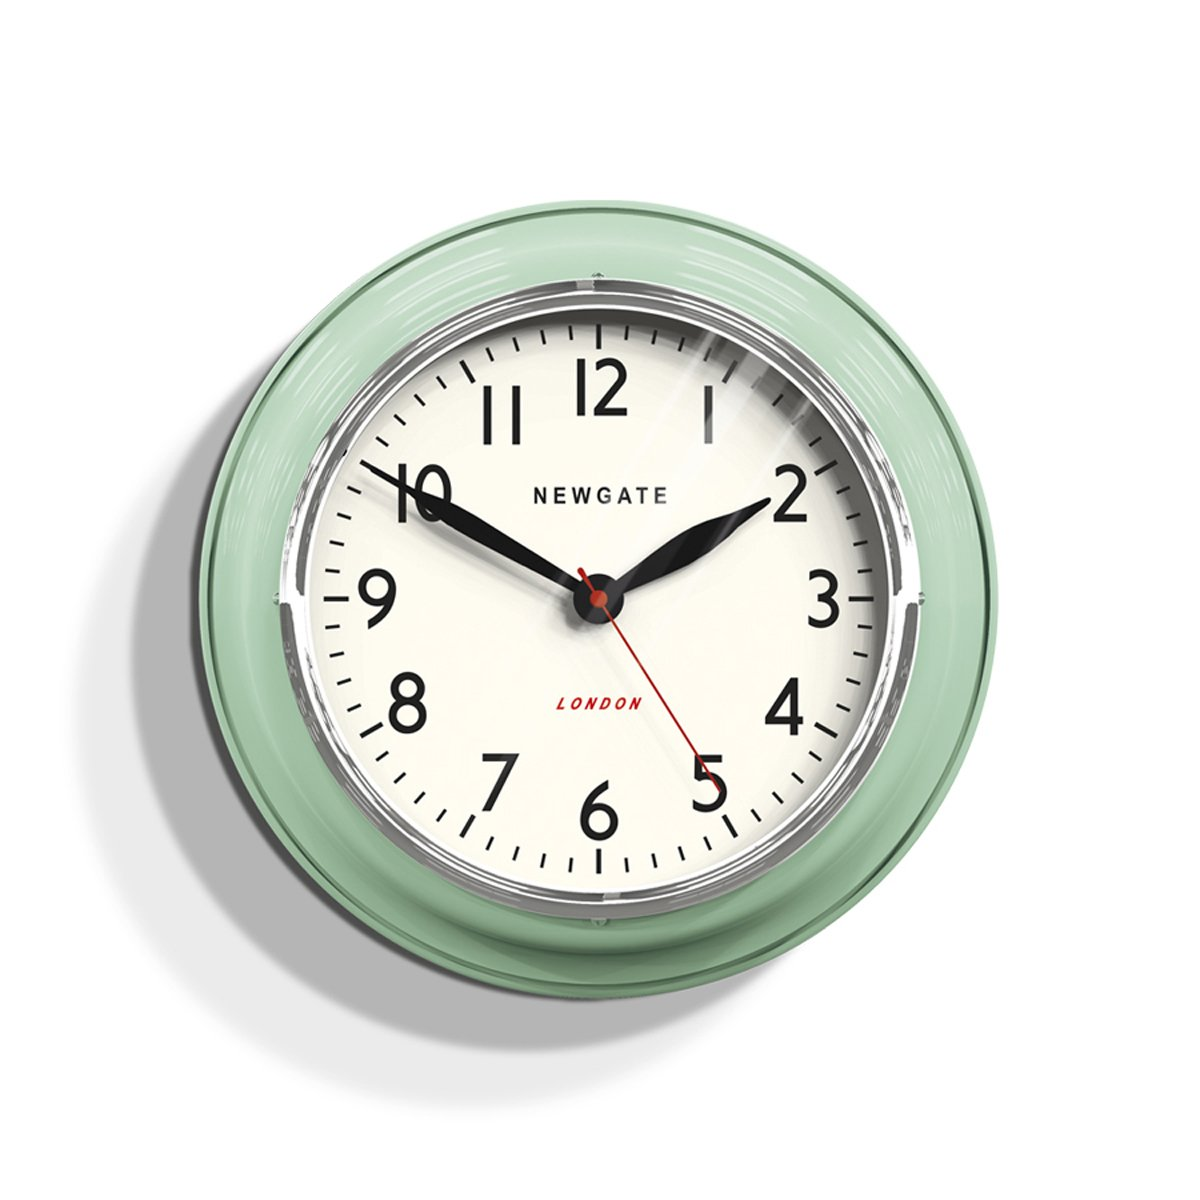 NEWGATE クックハウス クロック The Cook Houce Clock [ ミント/Lサイズ ] 壁掛け時計 B01N0EJ9P1ミントグリーン